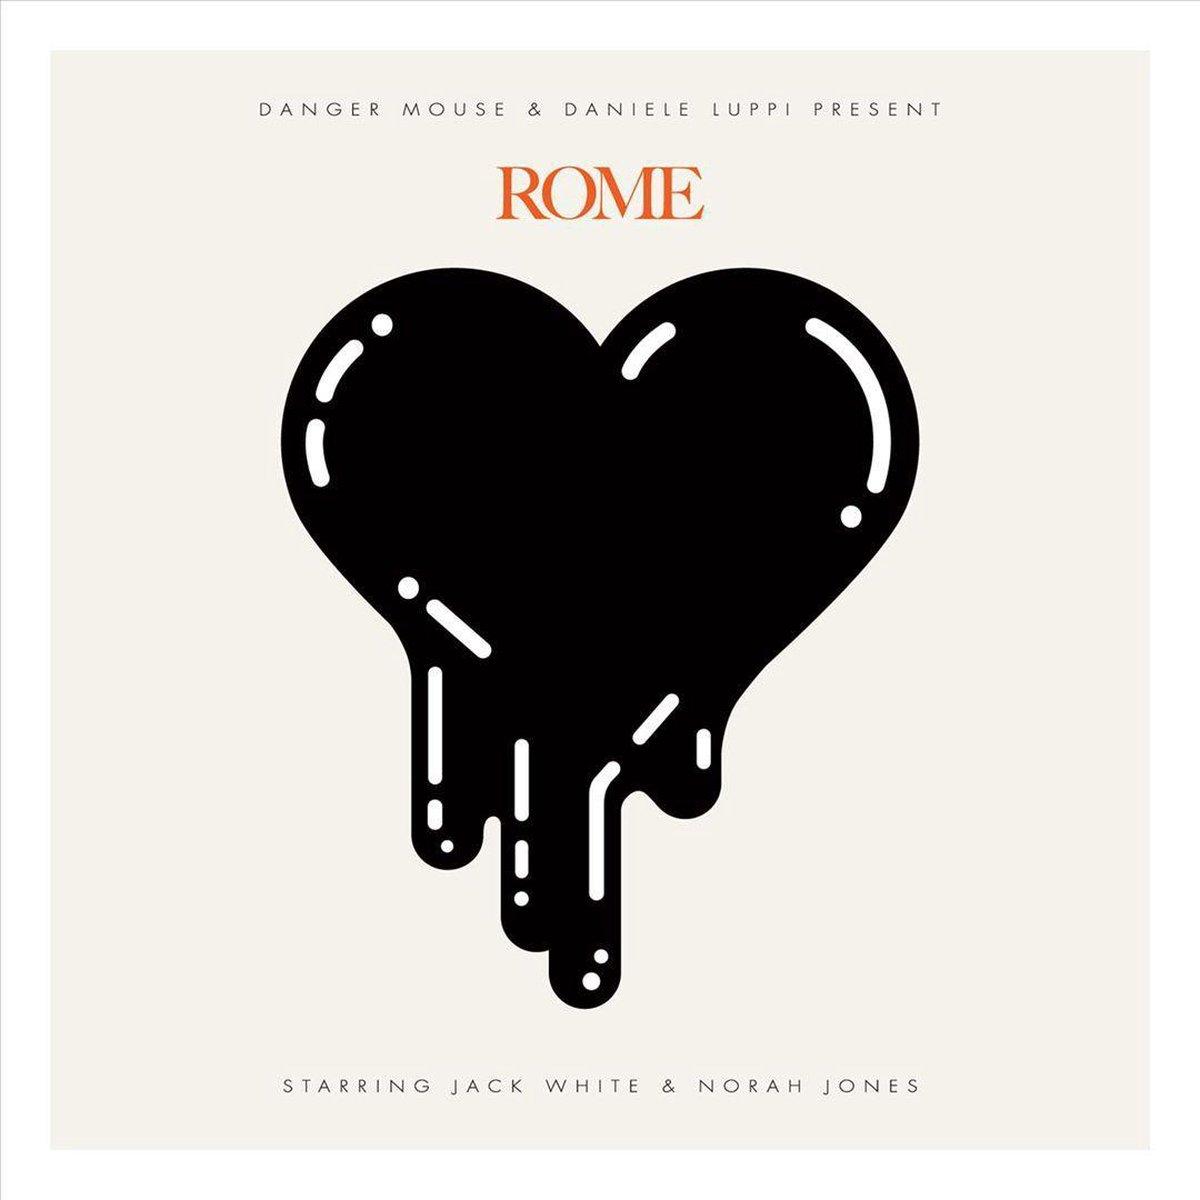 bol.com   Rome, Danger Mouse & Daniele Luppi   CD (album)   Muziek